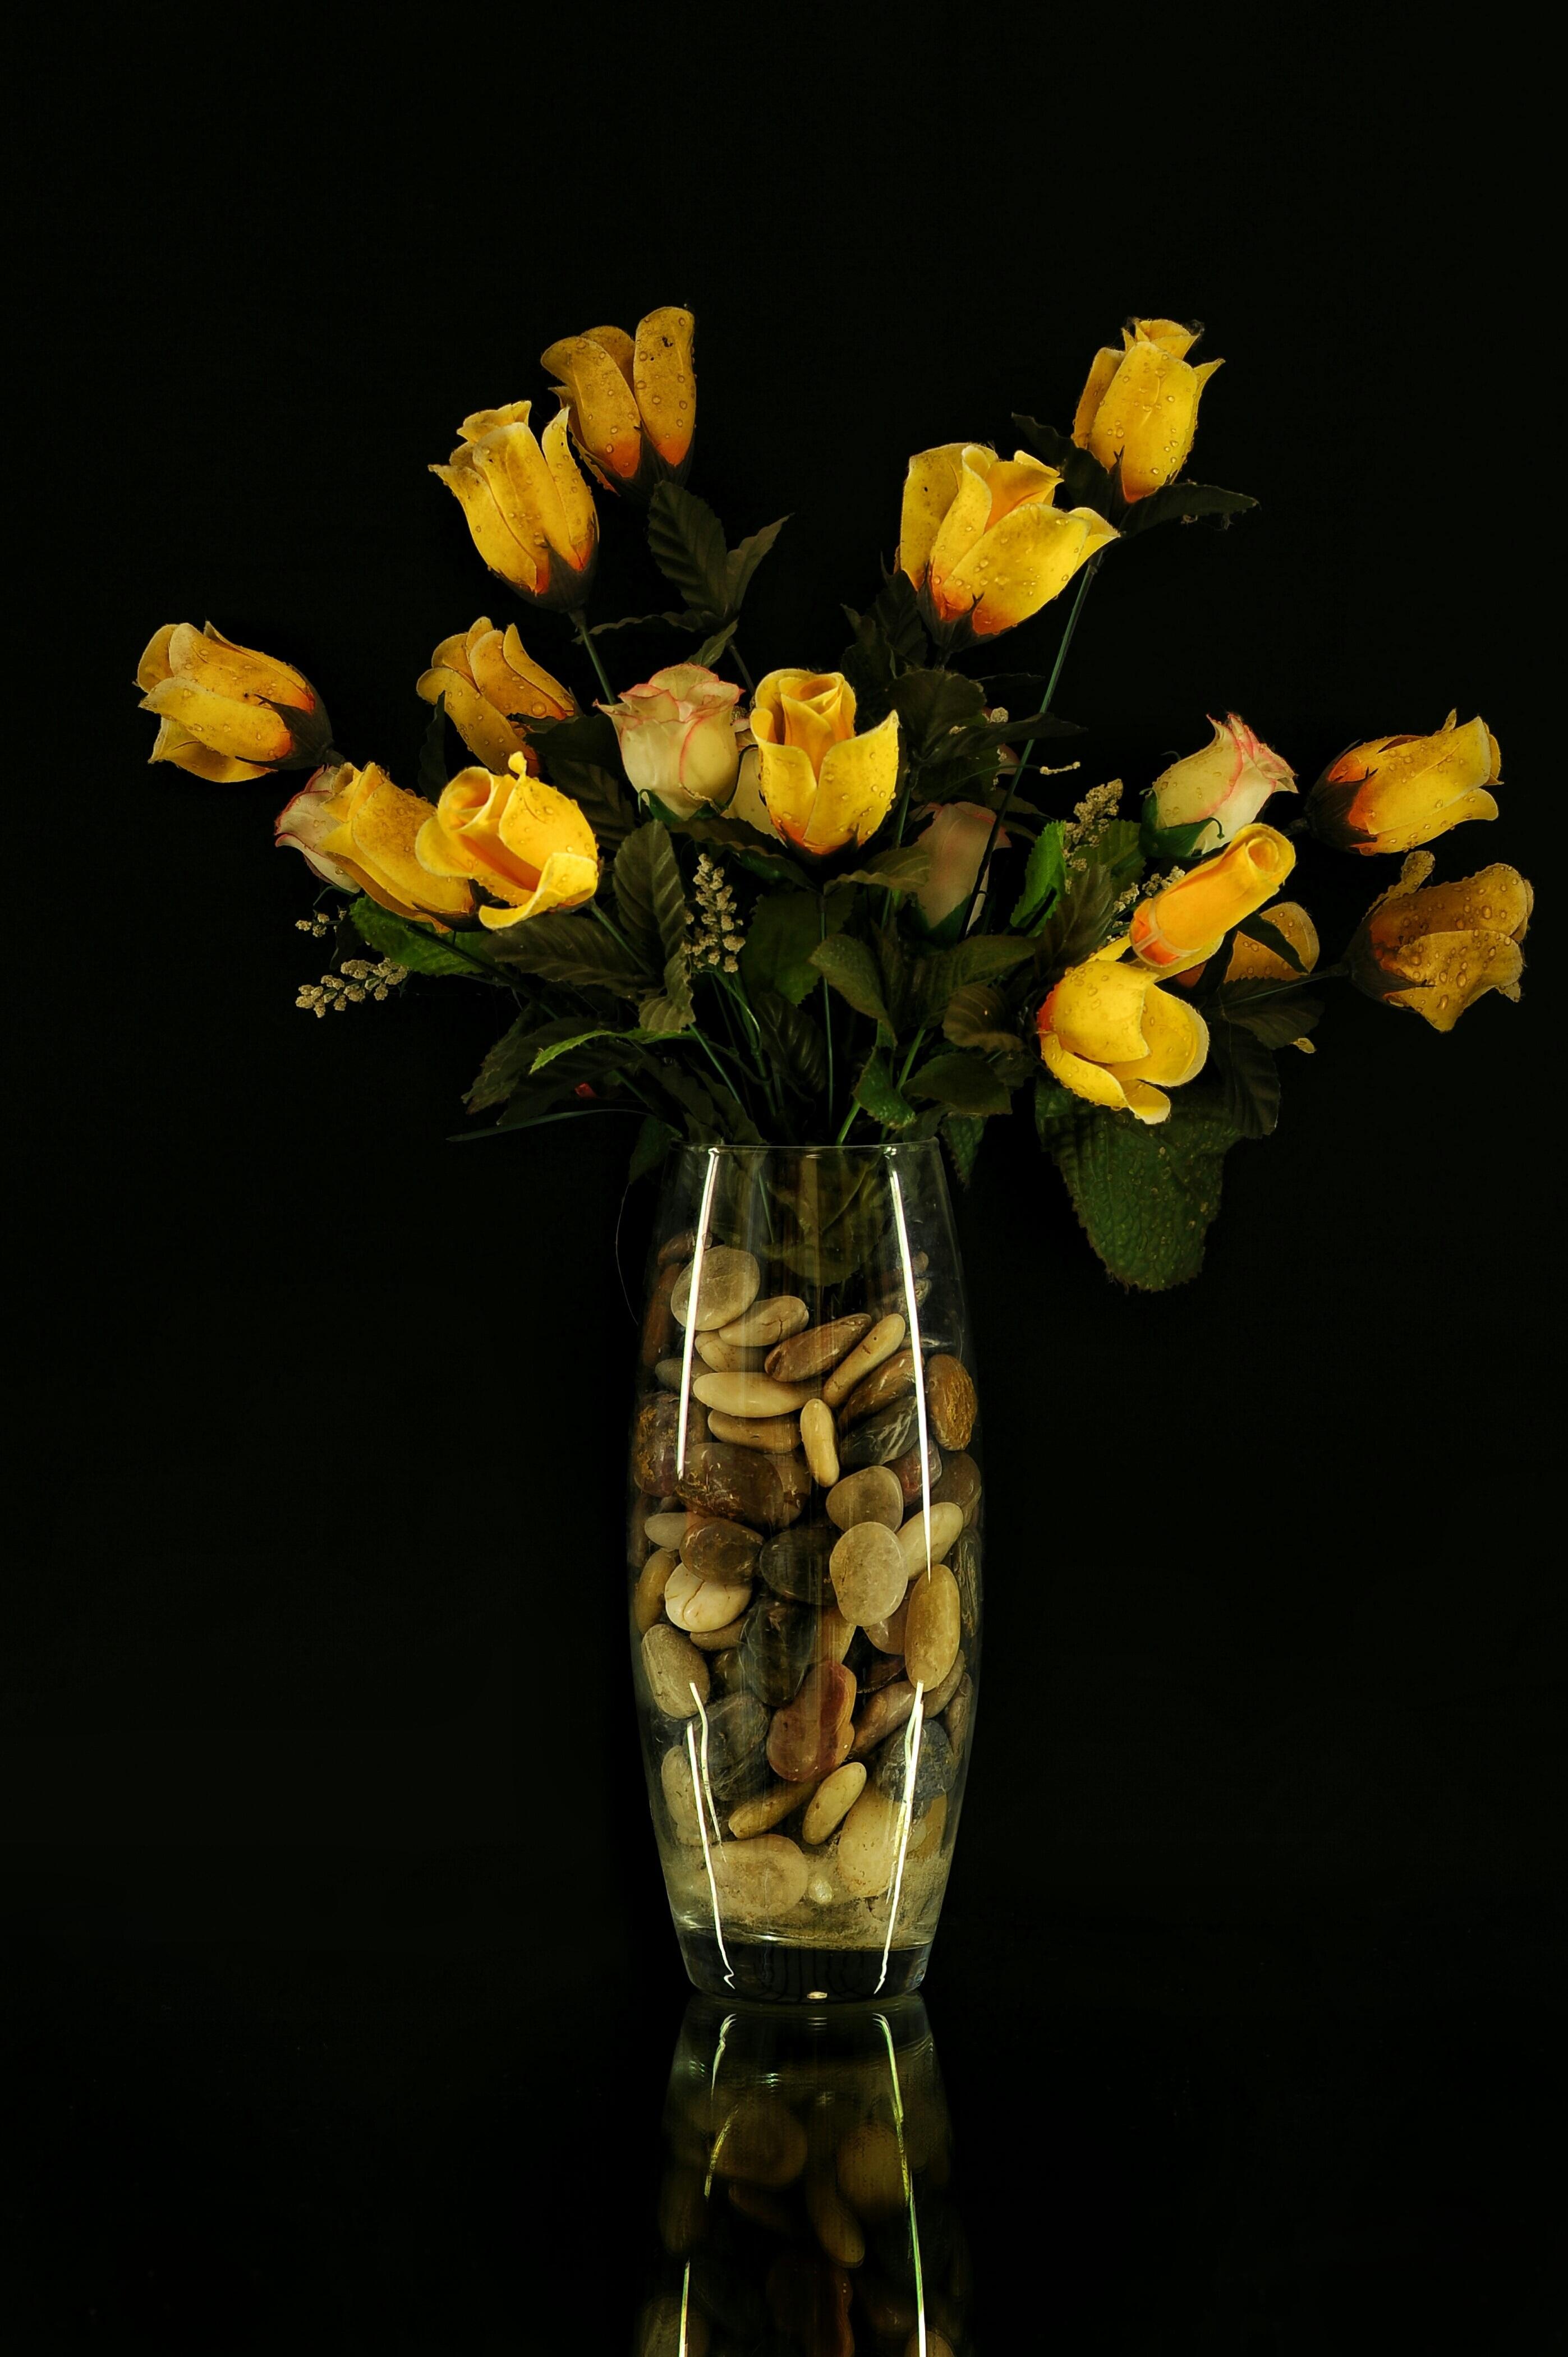 Free Images  nature, petal, dark, vase, rose, decoration